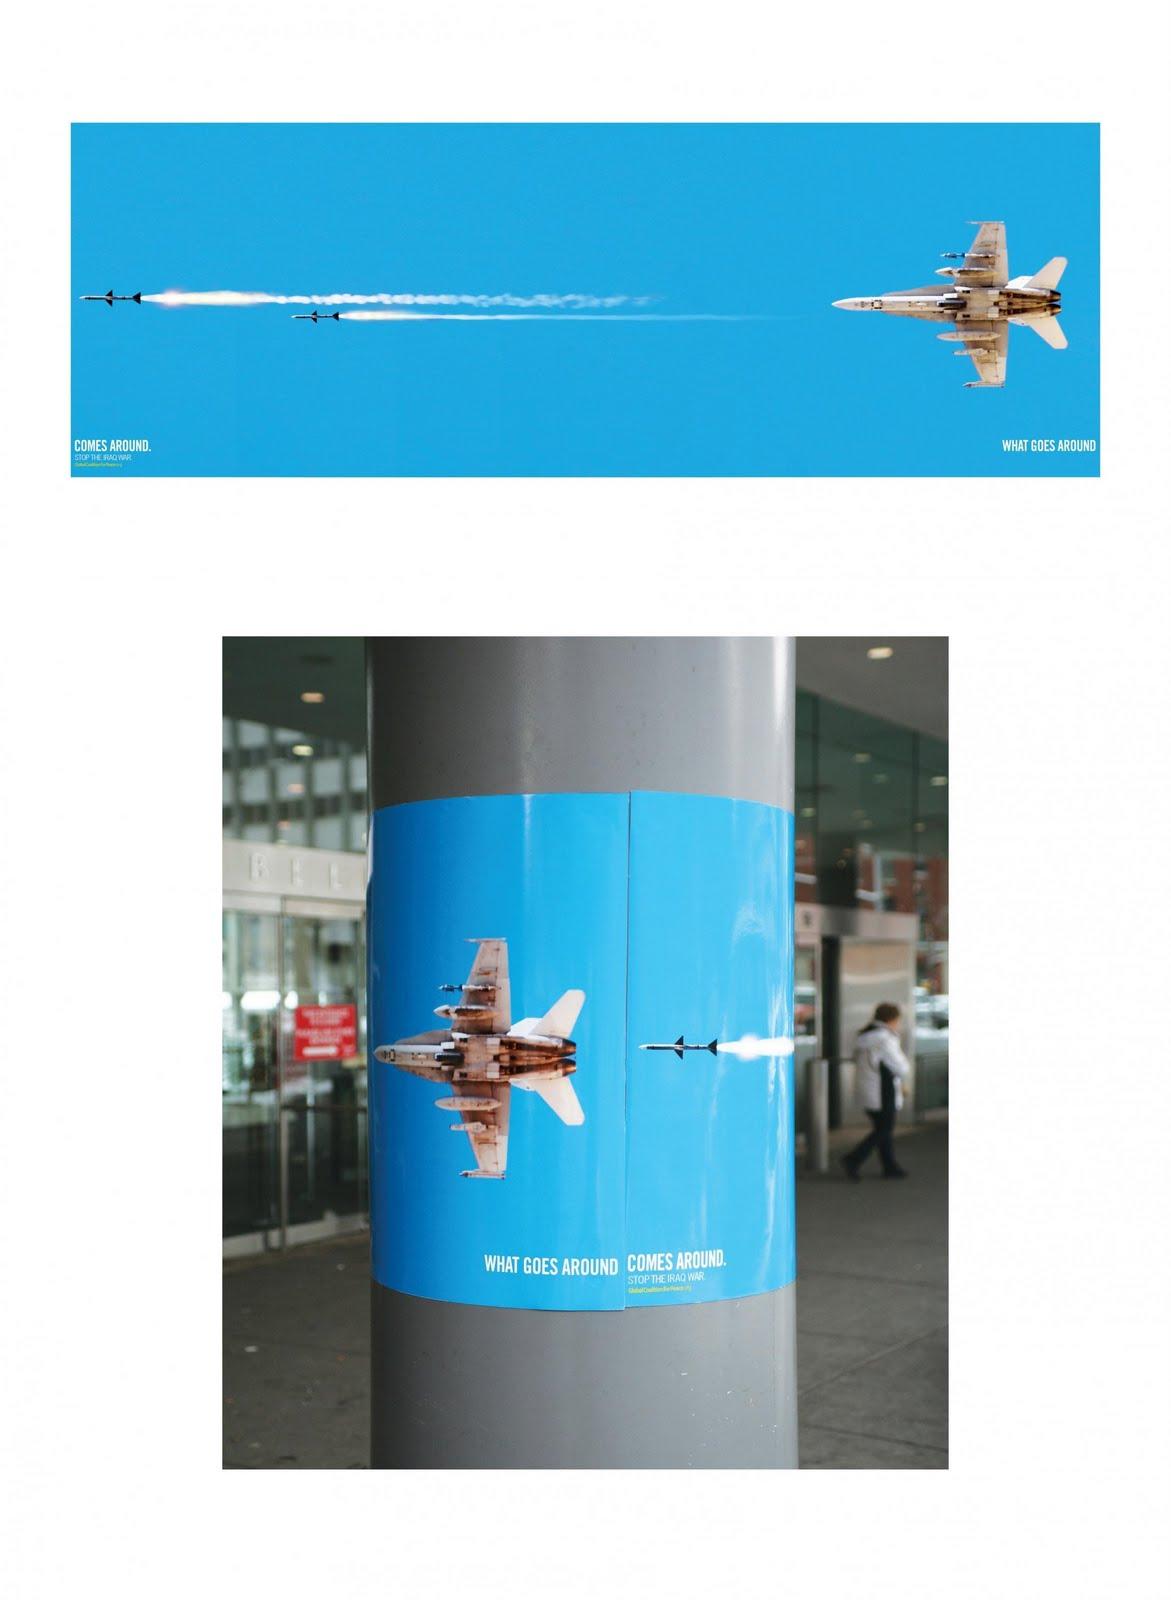 [missiles.jpg]